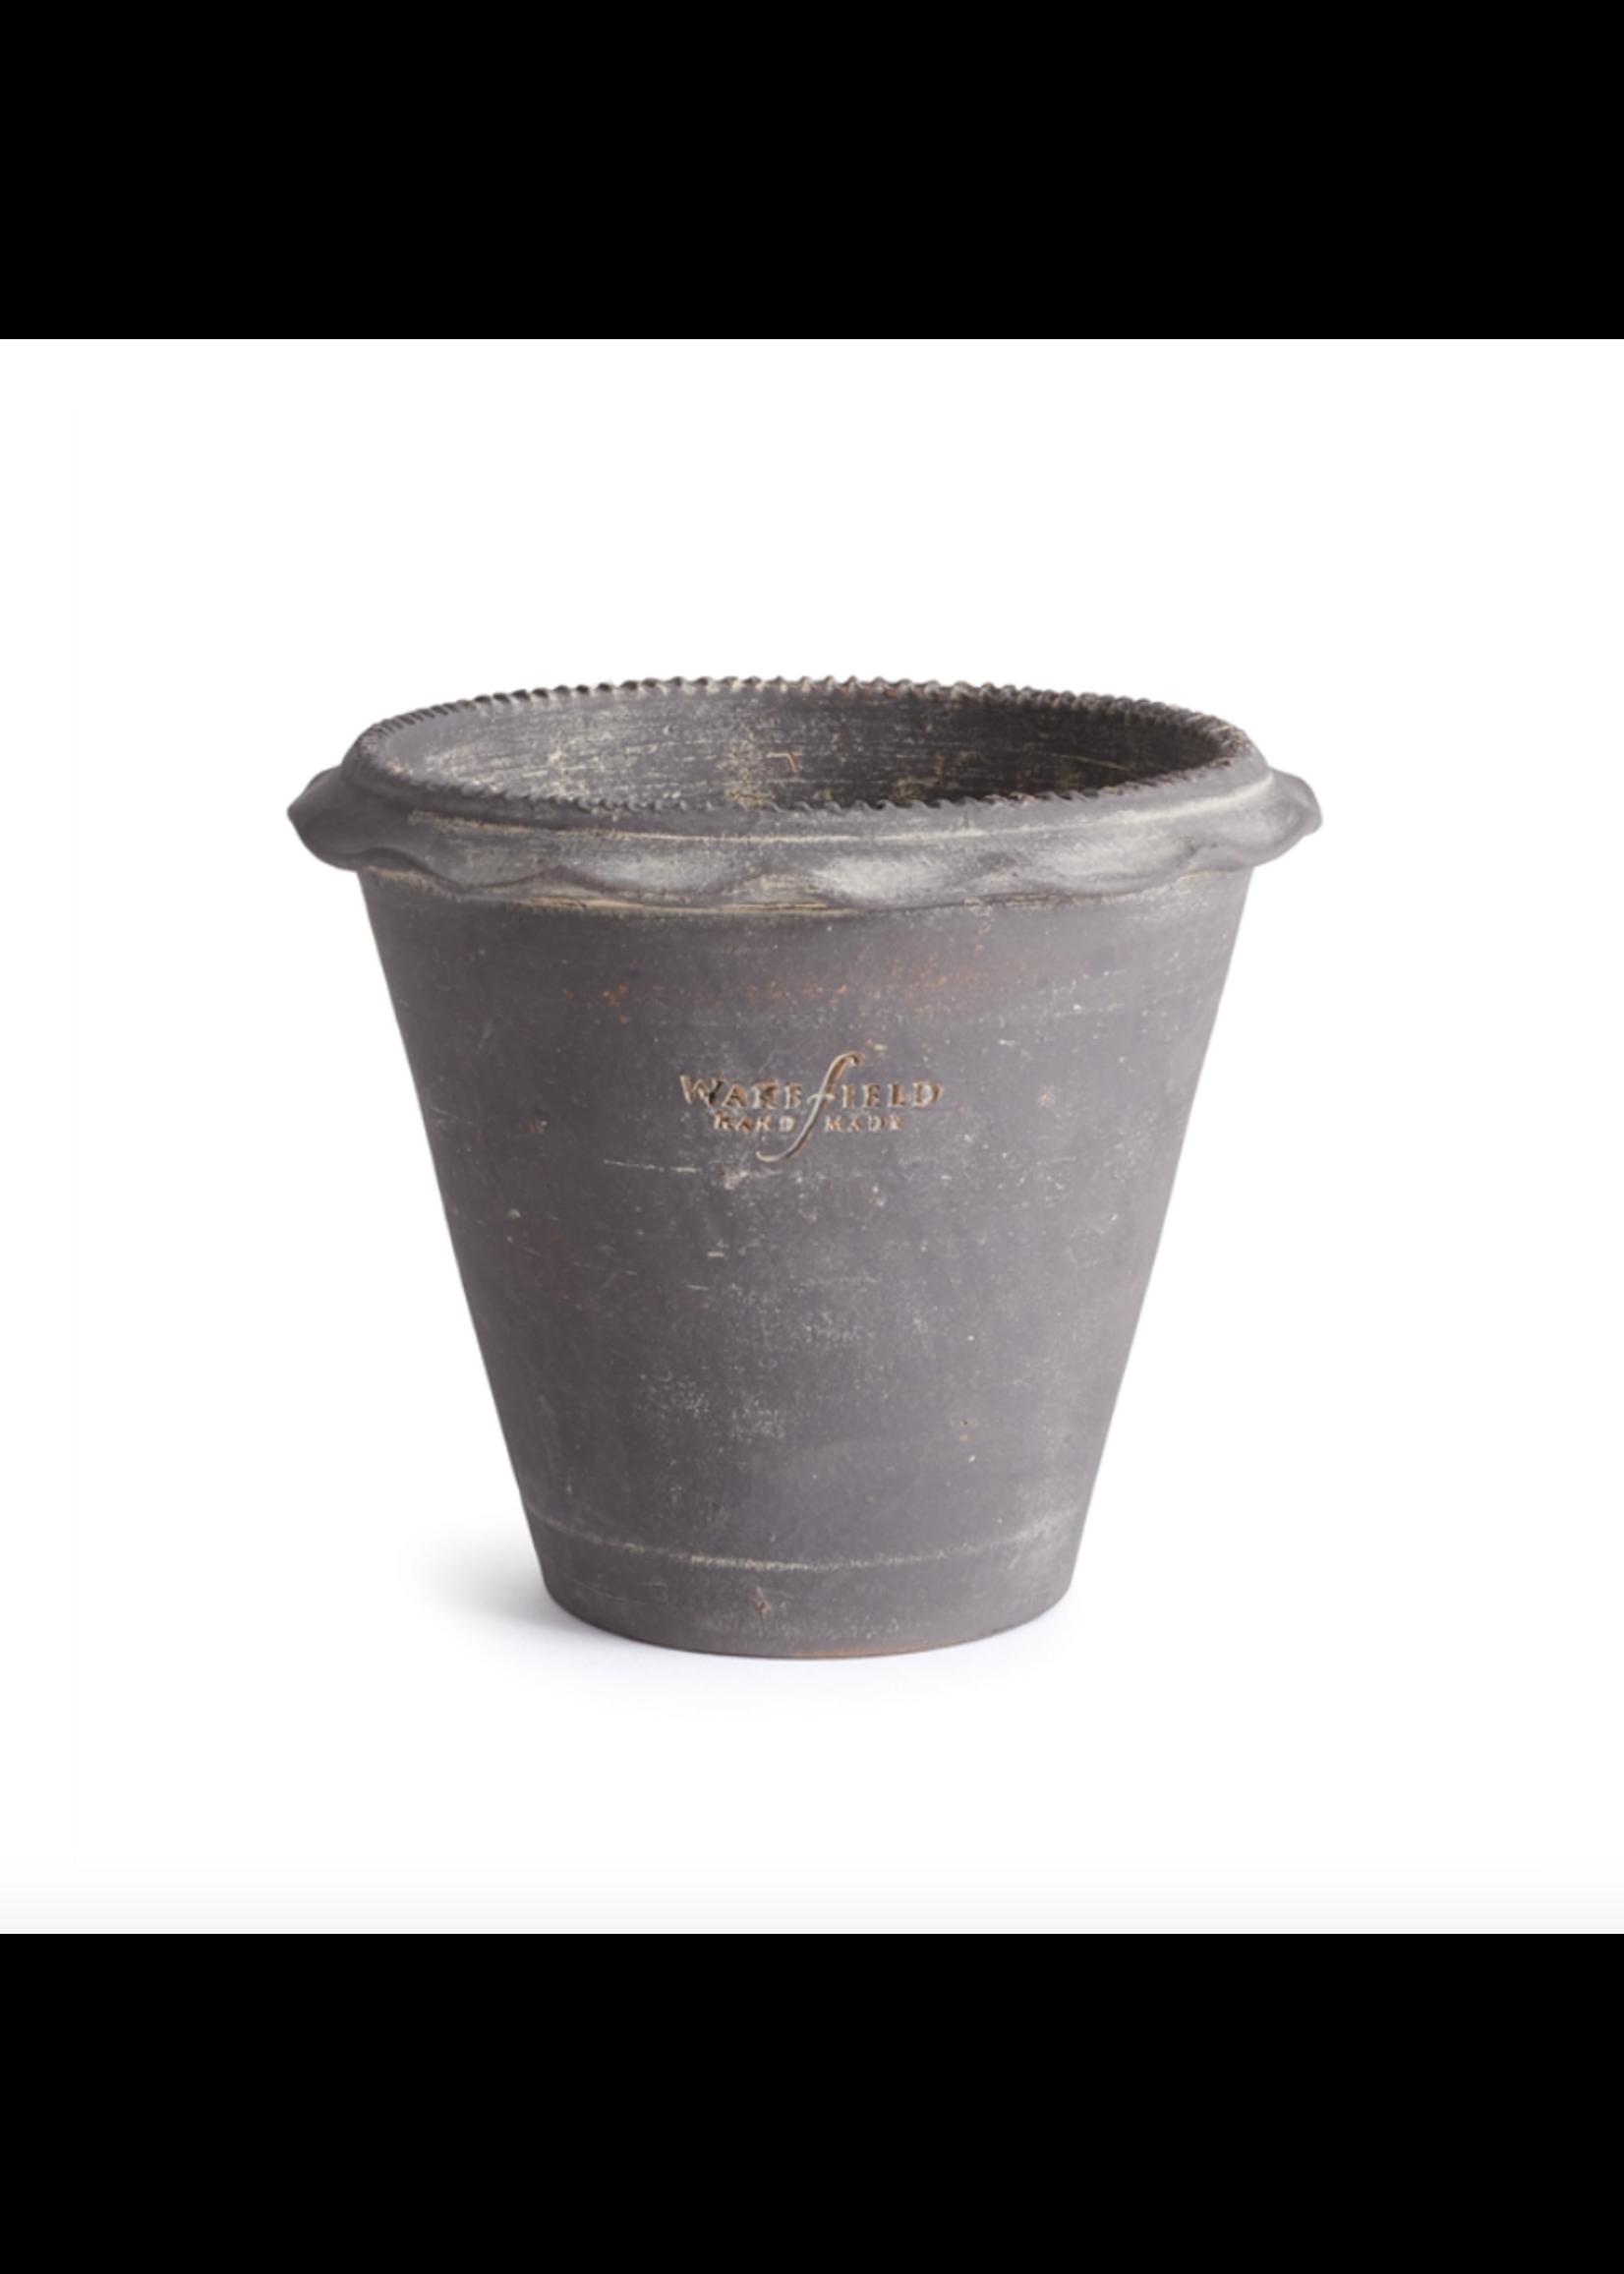 Wakefield Pottery - Norwood Pot - Grey #4